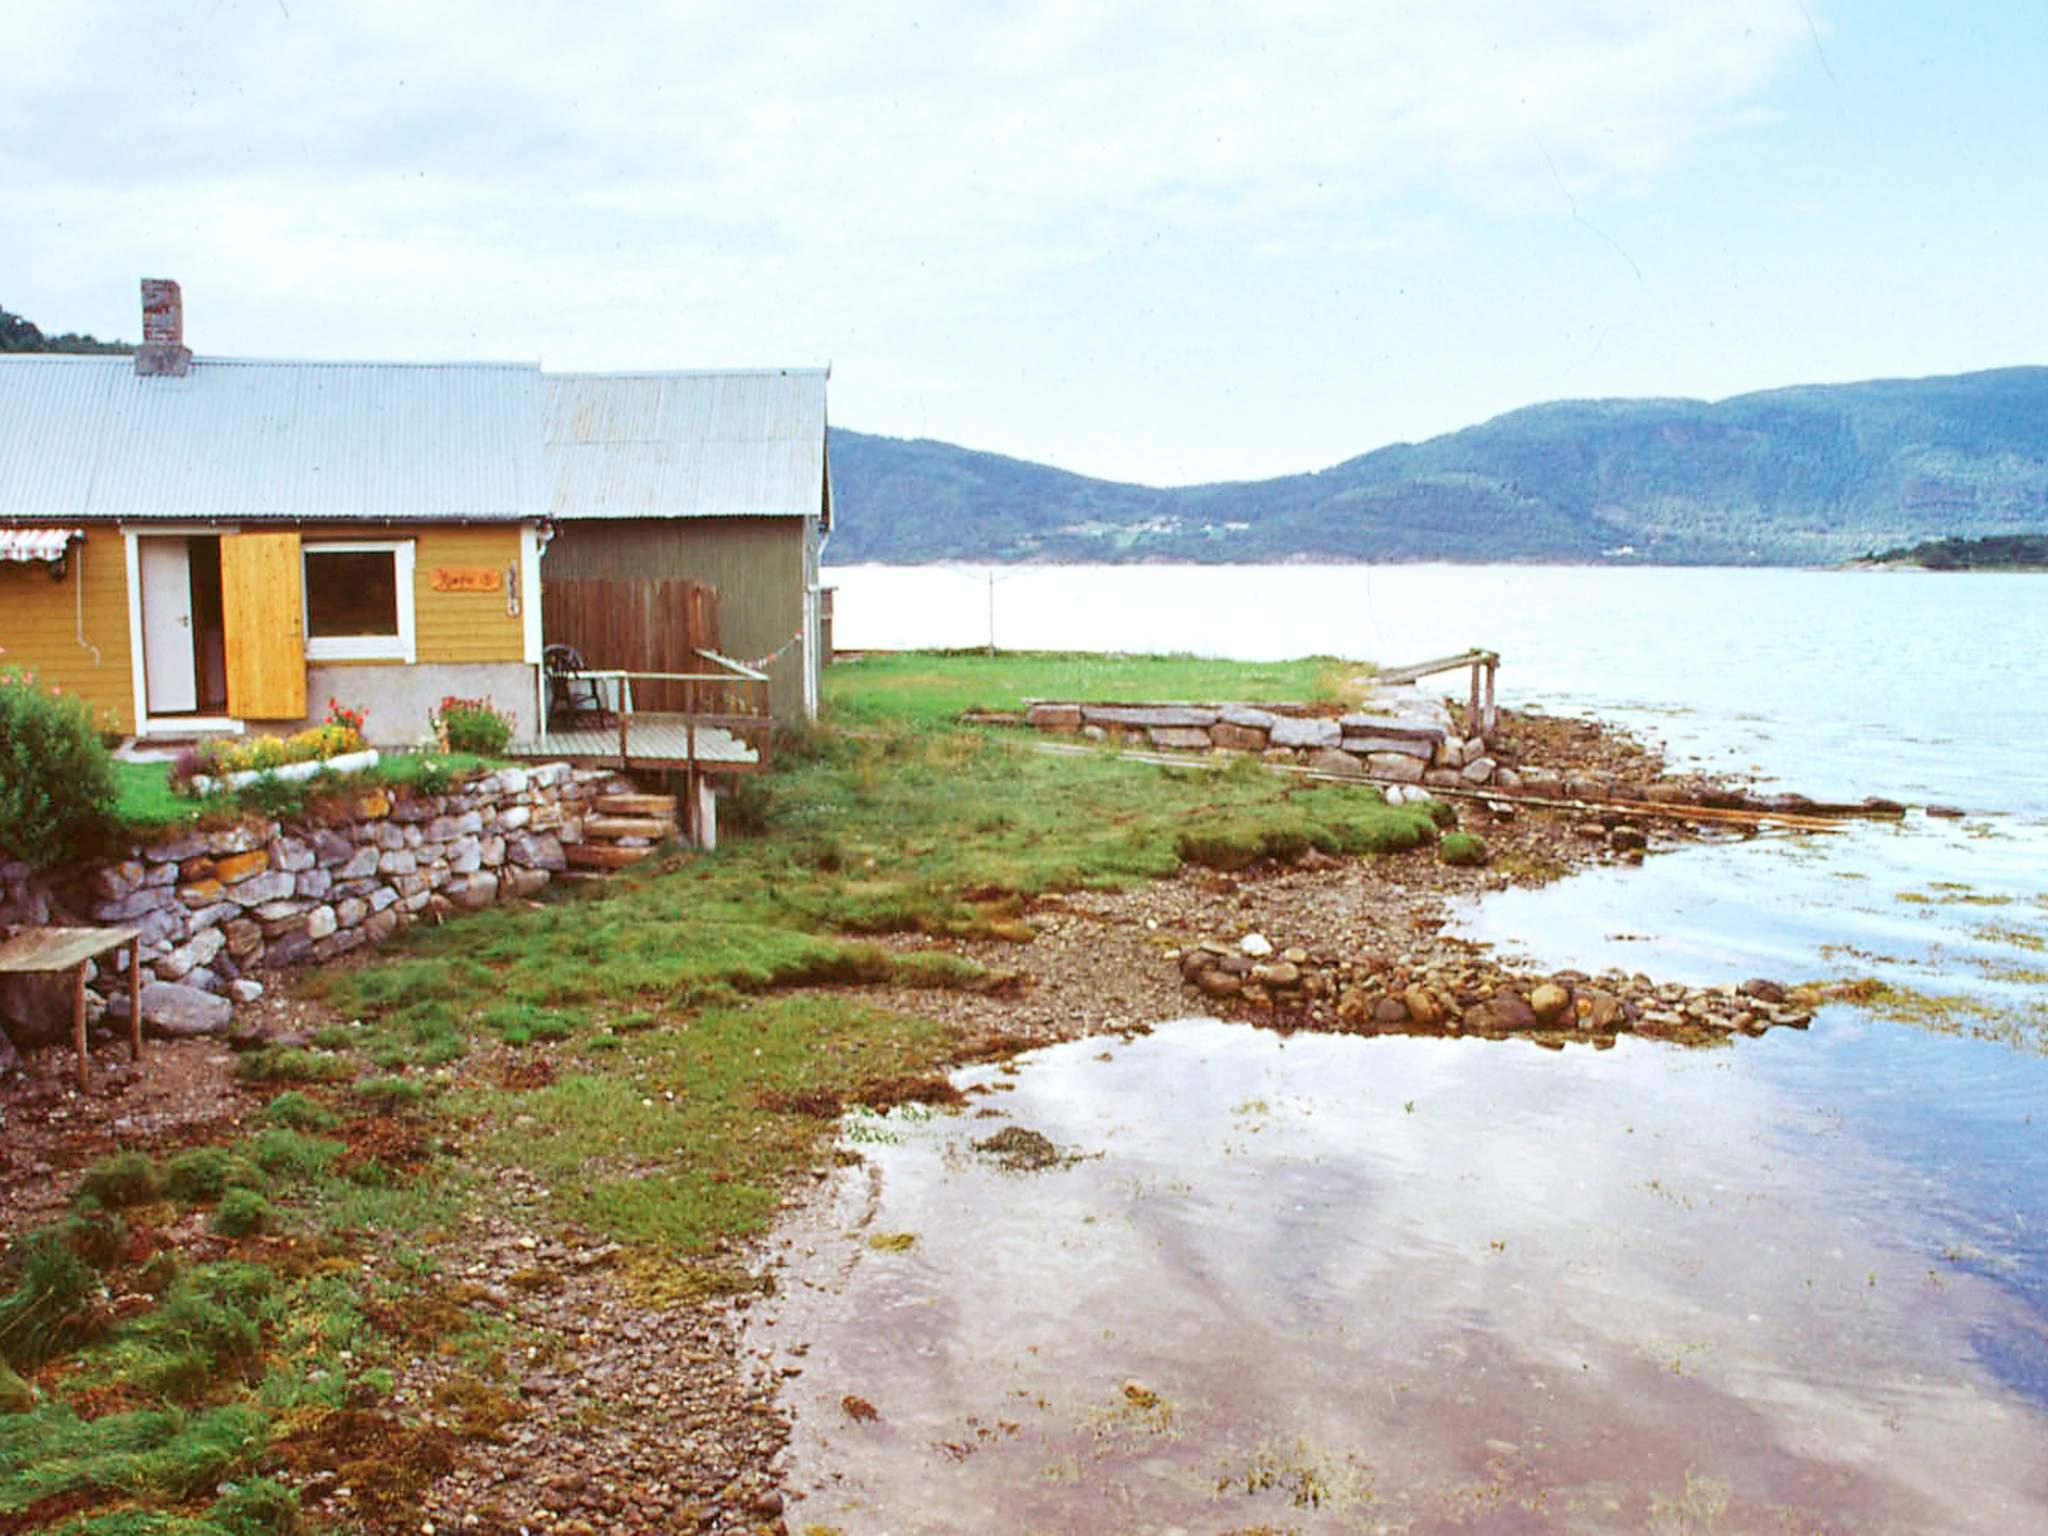 Ferienhaus Vistdal (85941), Vistdal, More - Romsdal, Westnorwegen, Norwegen, Bild 10